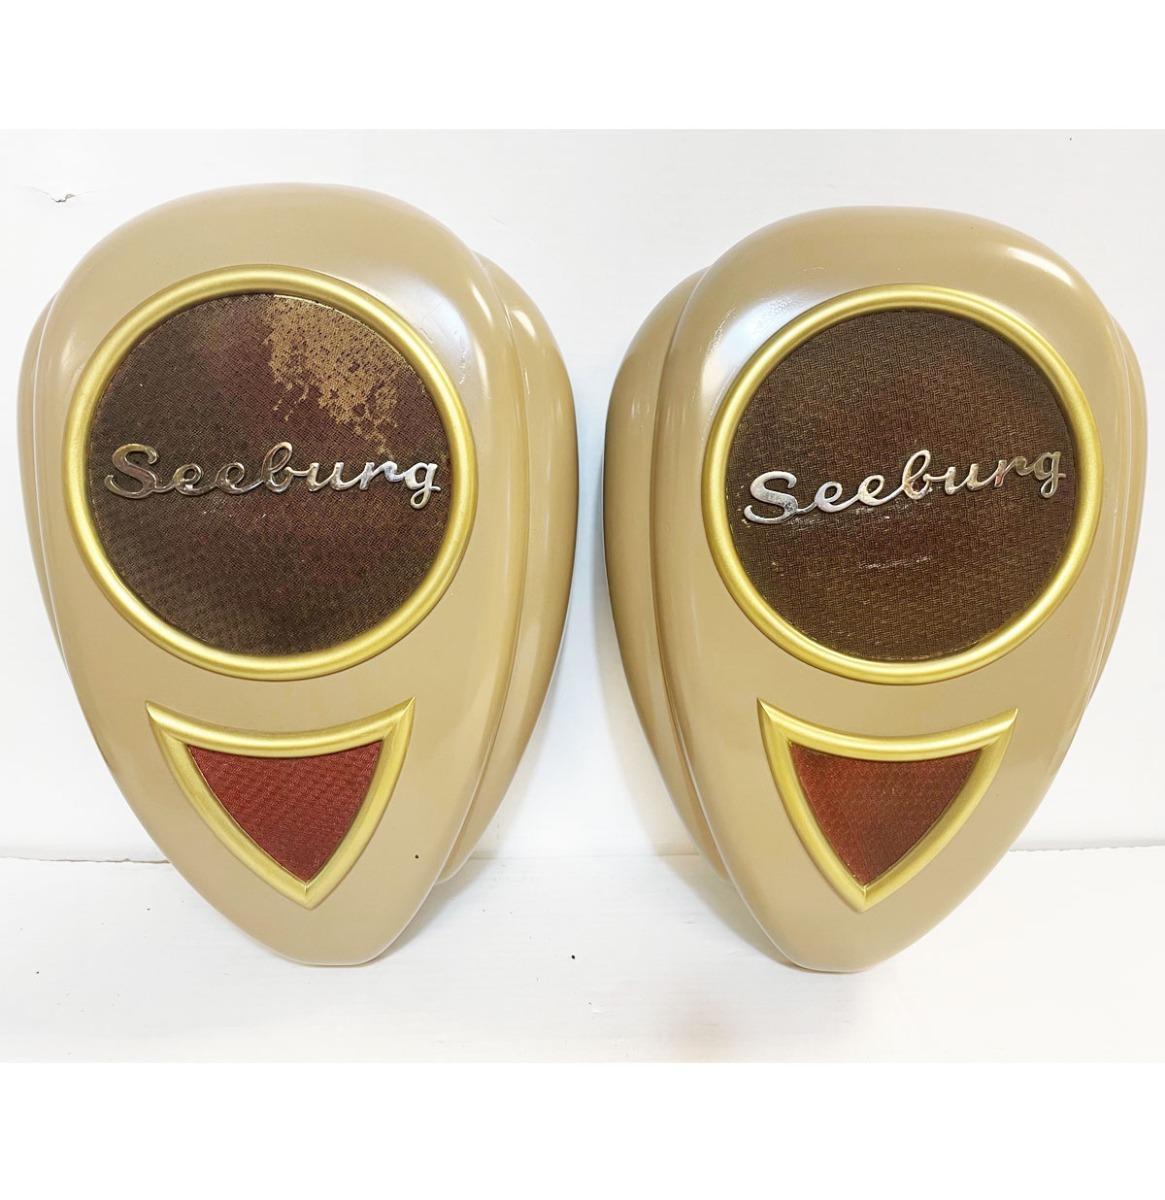 Originele Seeburg Teardrop Speakers - SET van 2